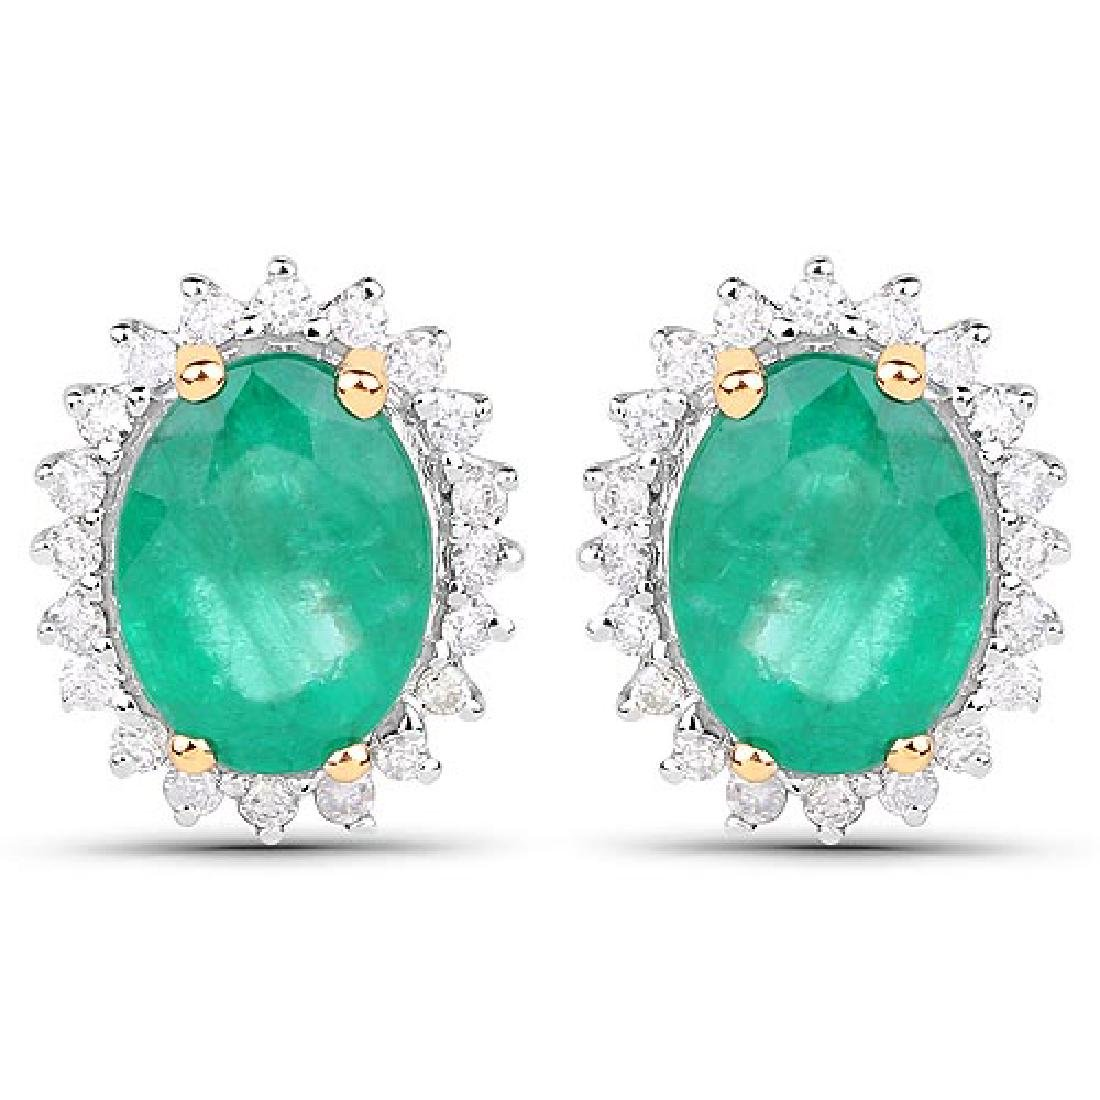 2.75 Carat Genuine Zambian Emerald and White Diamond 14